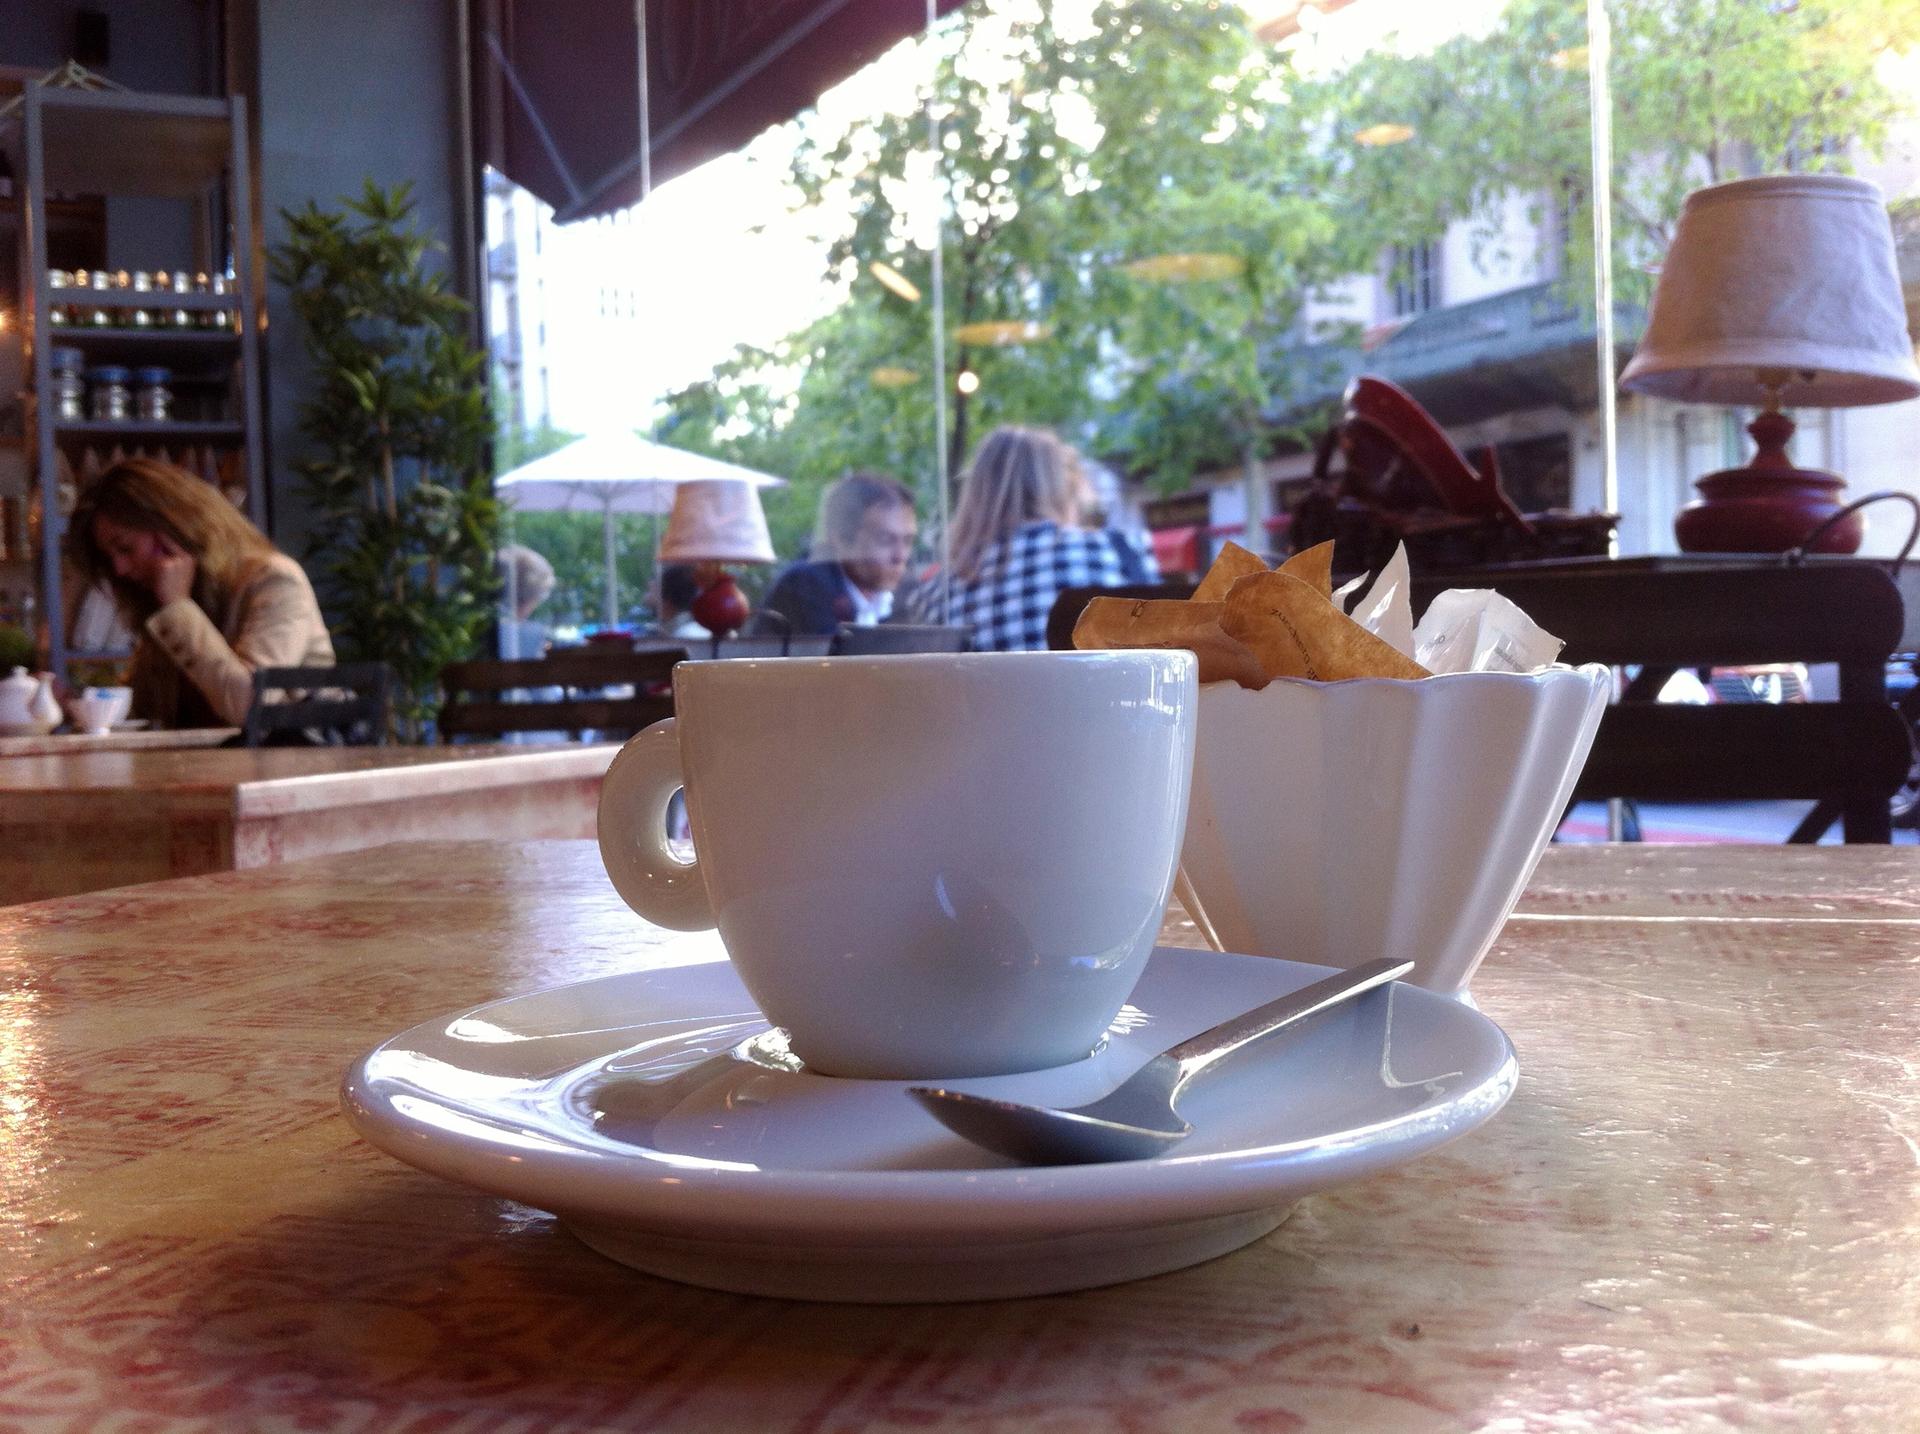 Coffee break | gato.gordi, beverage, breakfast, cafe